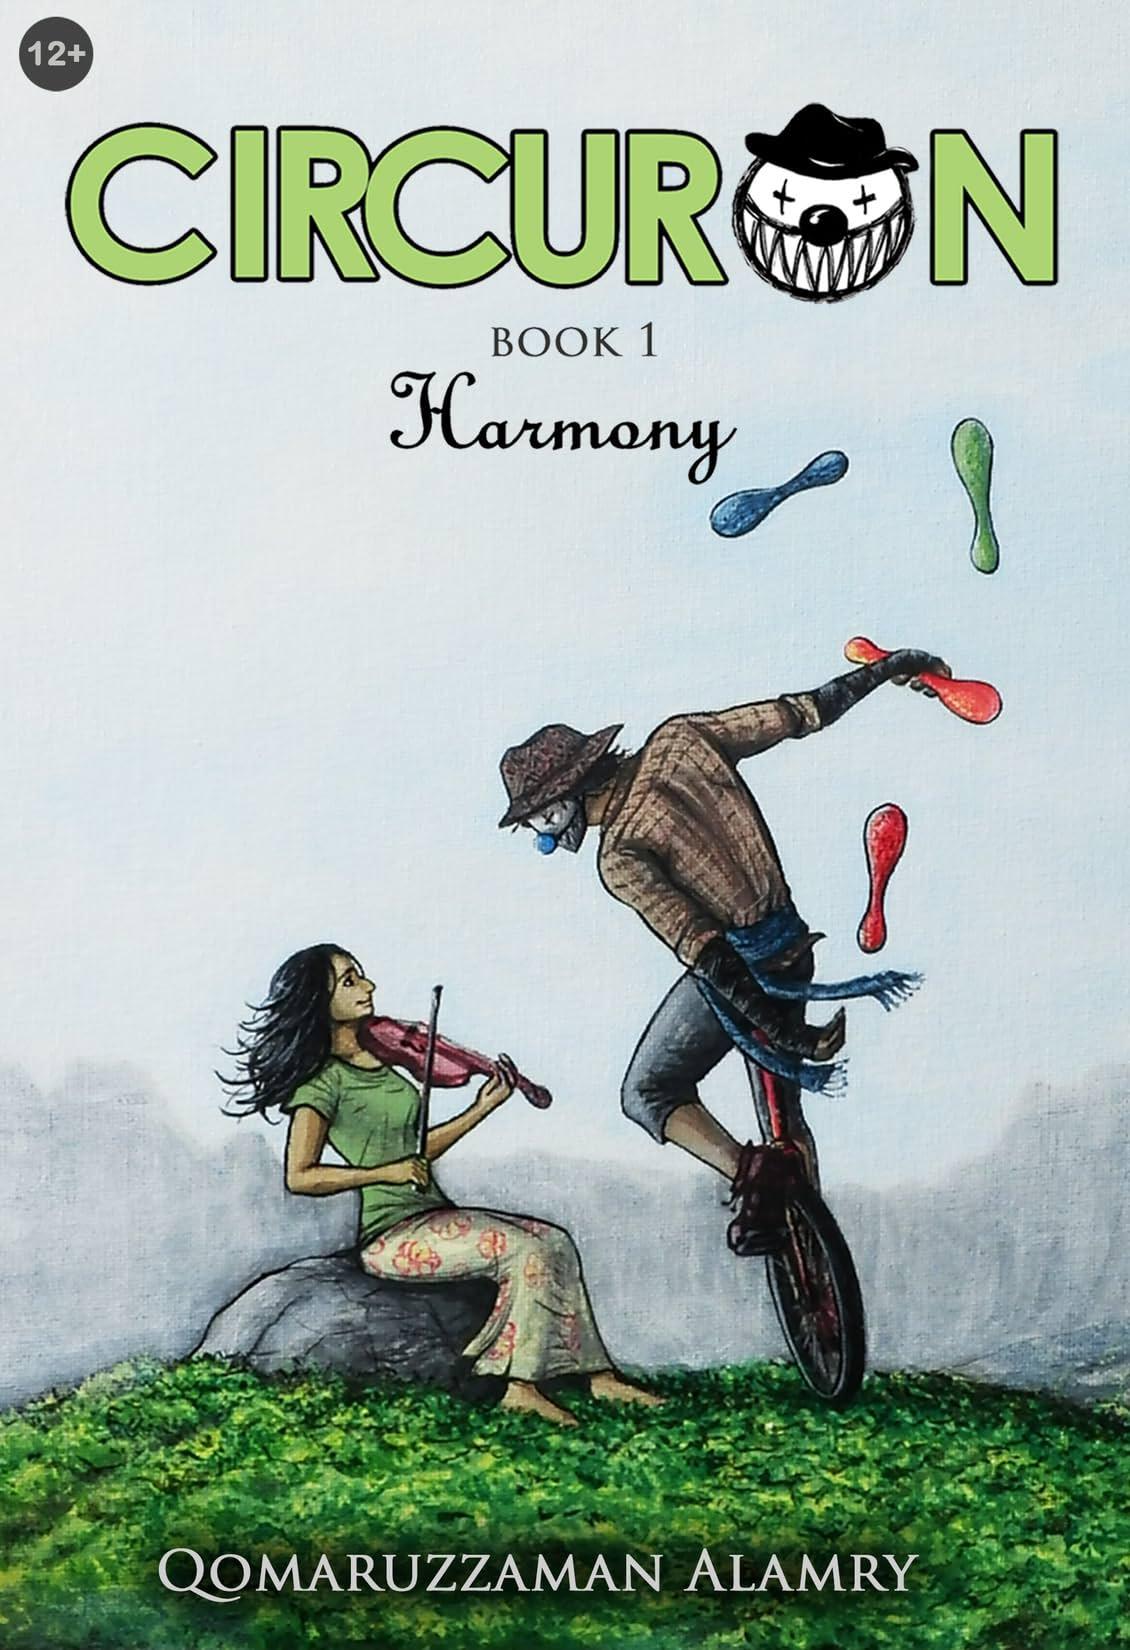 Circuron #1: Harmony